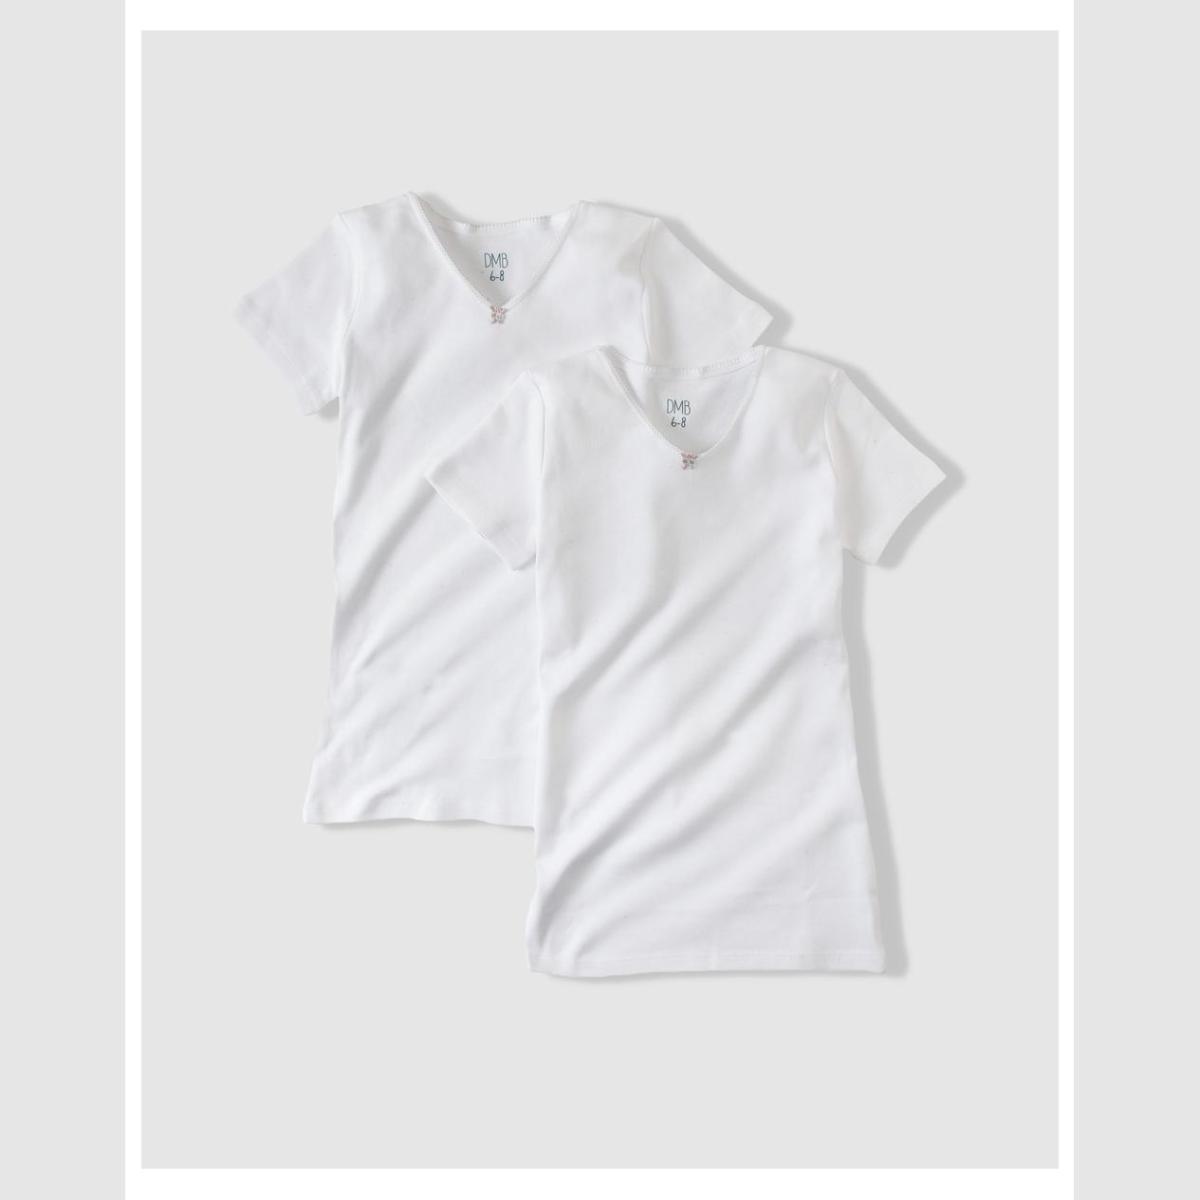 UNIT NINA COTTON UNDERWEAR PACK 2 рубашки с короткими рукавами. Комбинации   